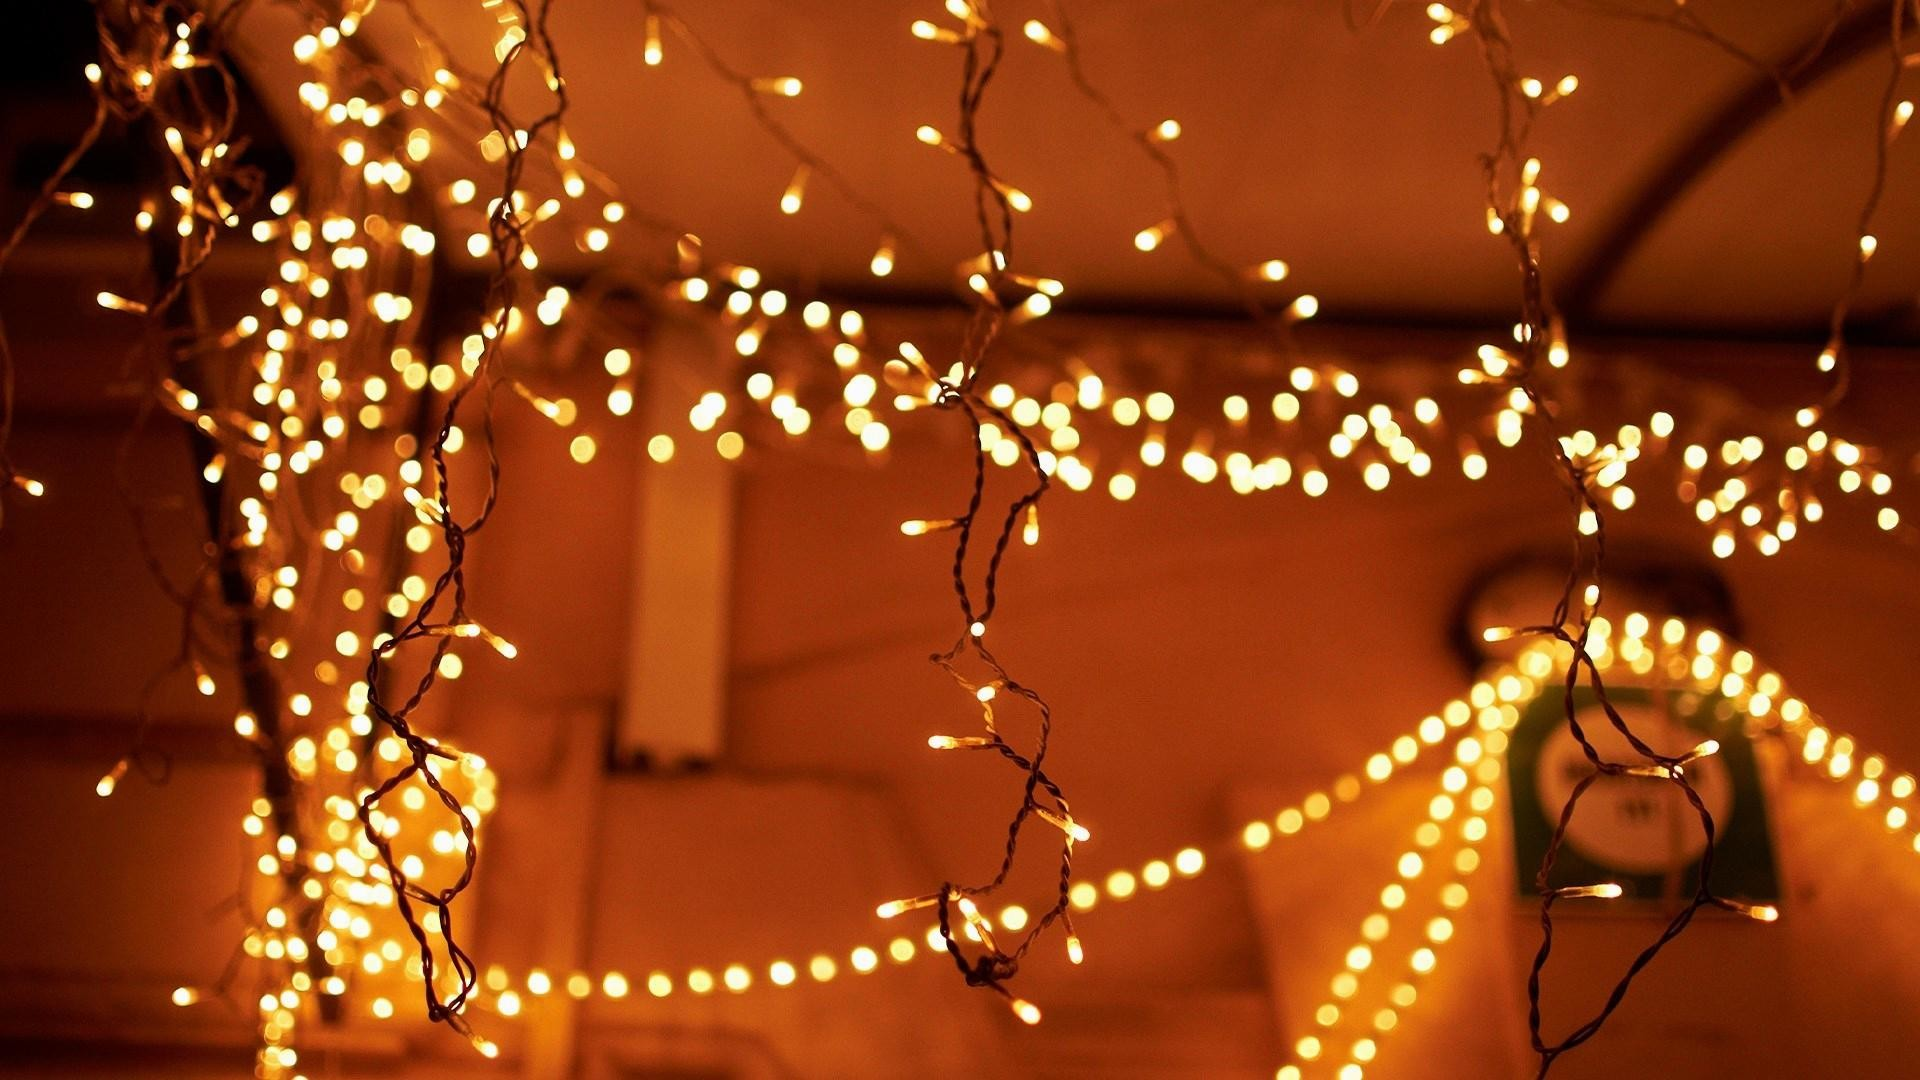 100 Holiday Lights Desktop Wallpaper Hd Wallpapers: Christmas Lights Wallpapers (67+ Images